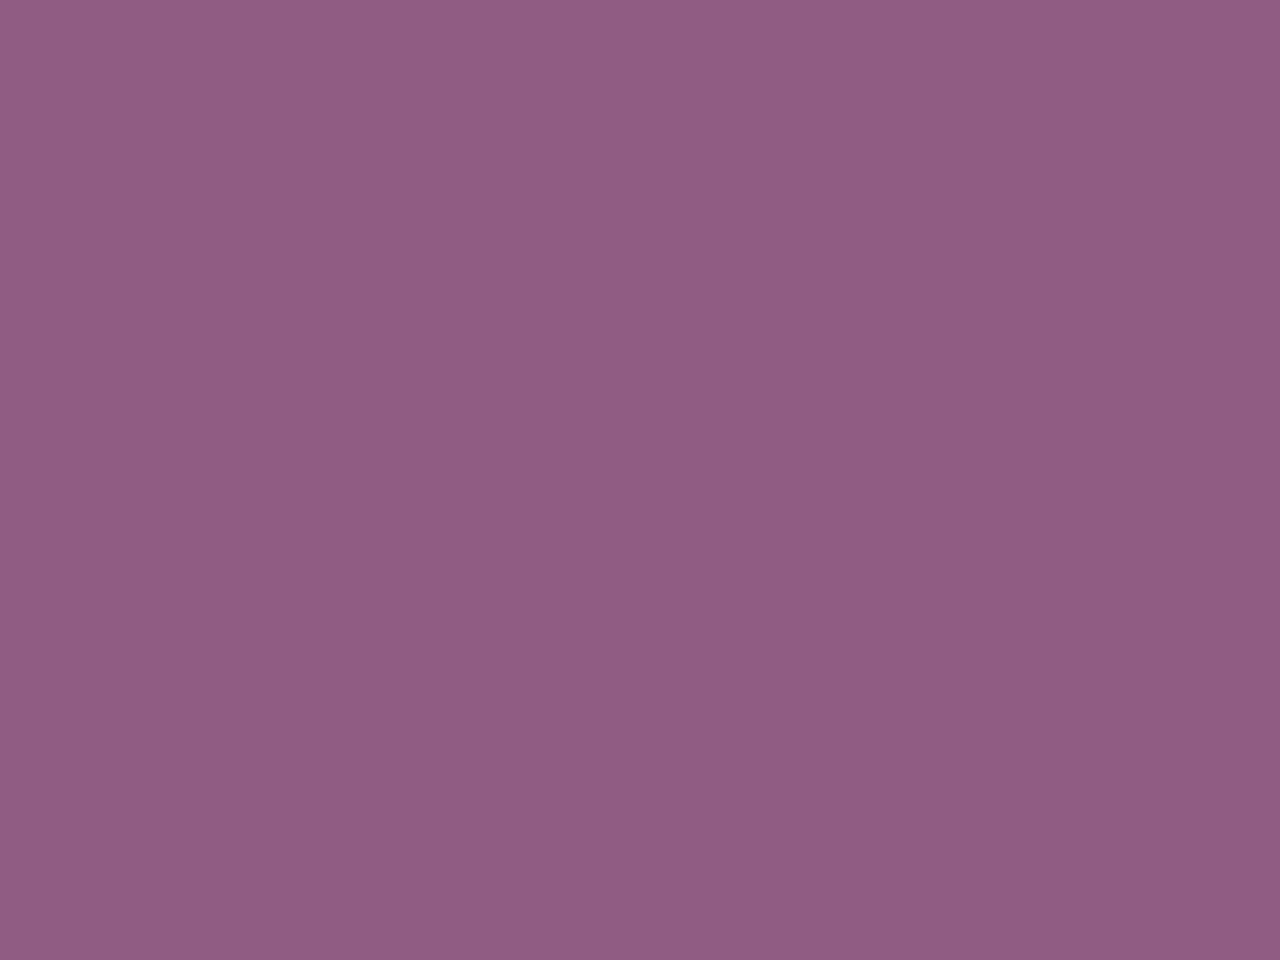 1280x960 Antique Fuchsia Solid Color Background